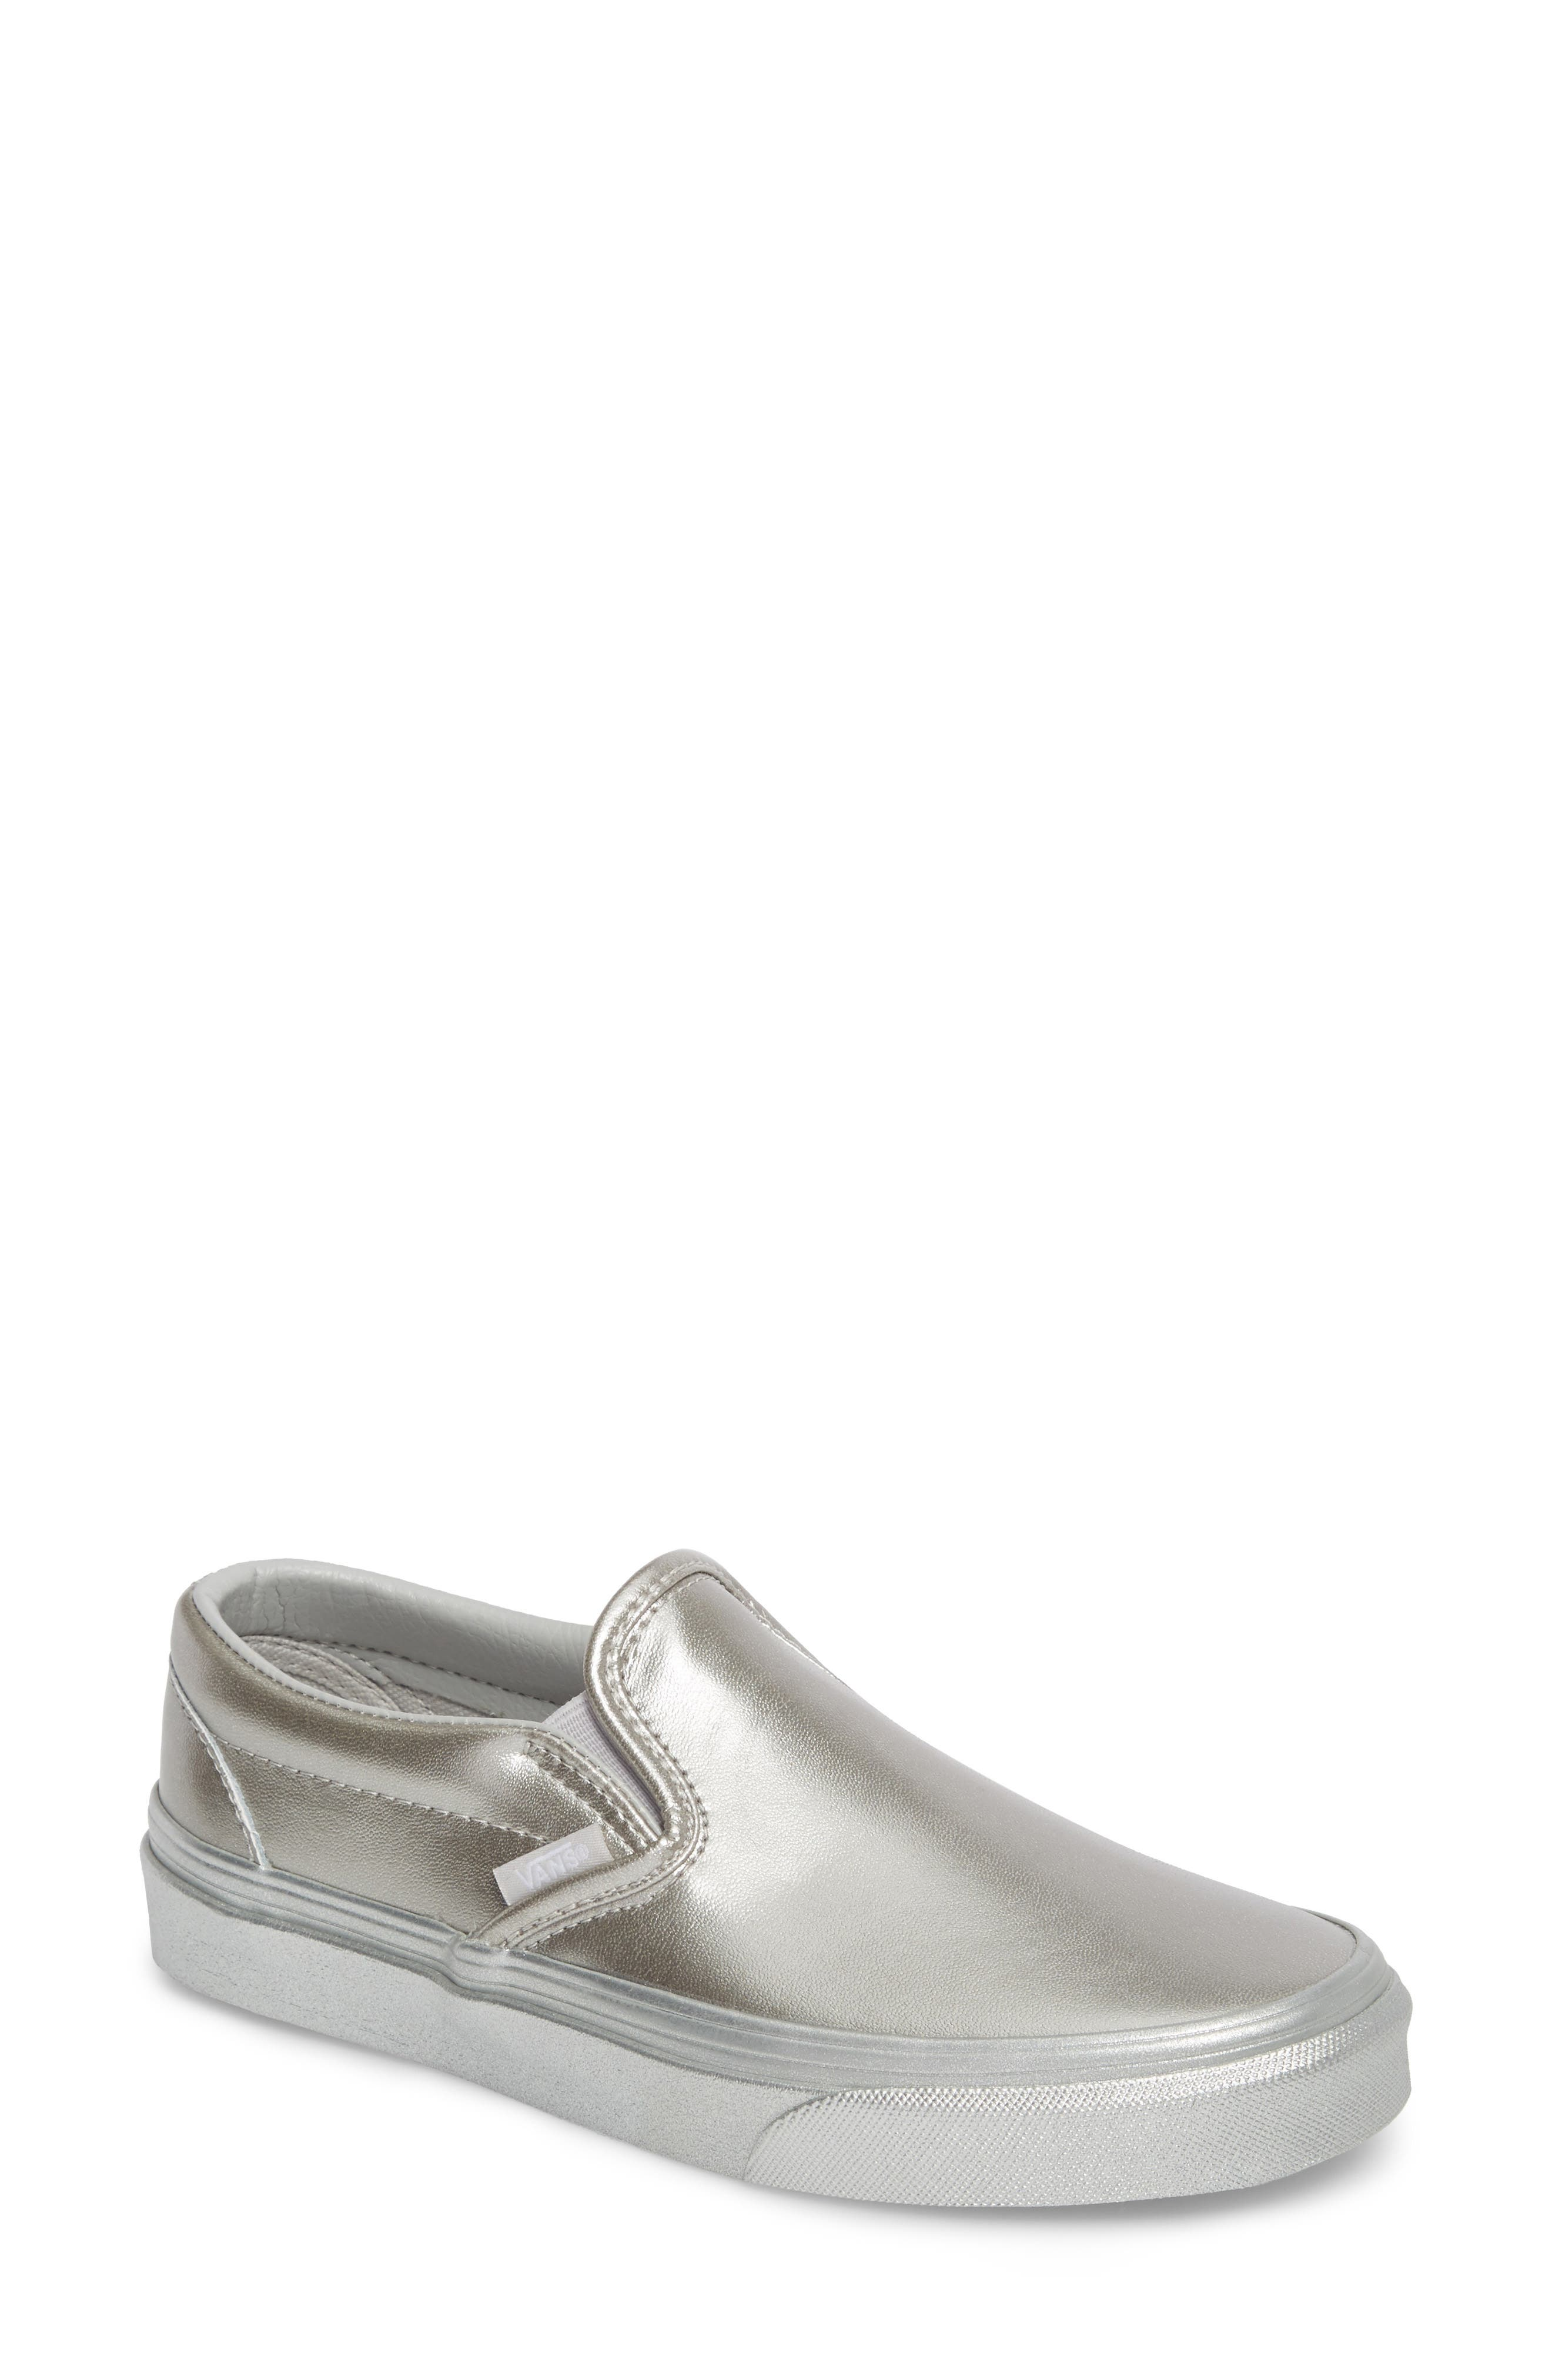 ,                             Classic Slip-On Sneaker,                             Main thumbnail 99, color,                             045